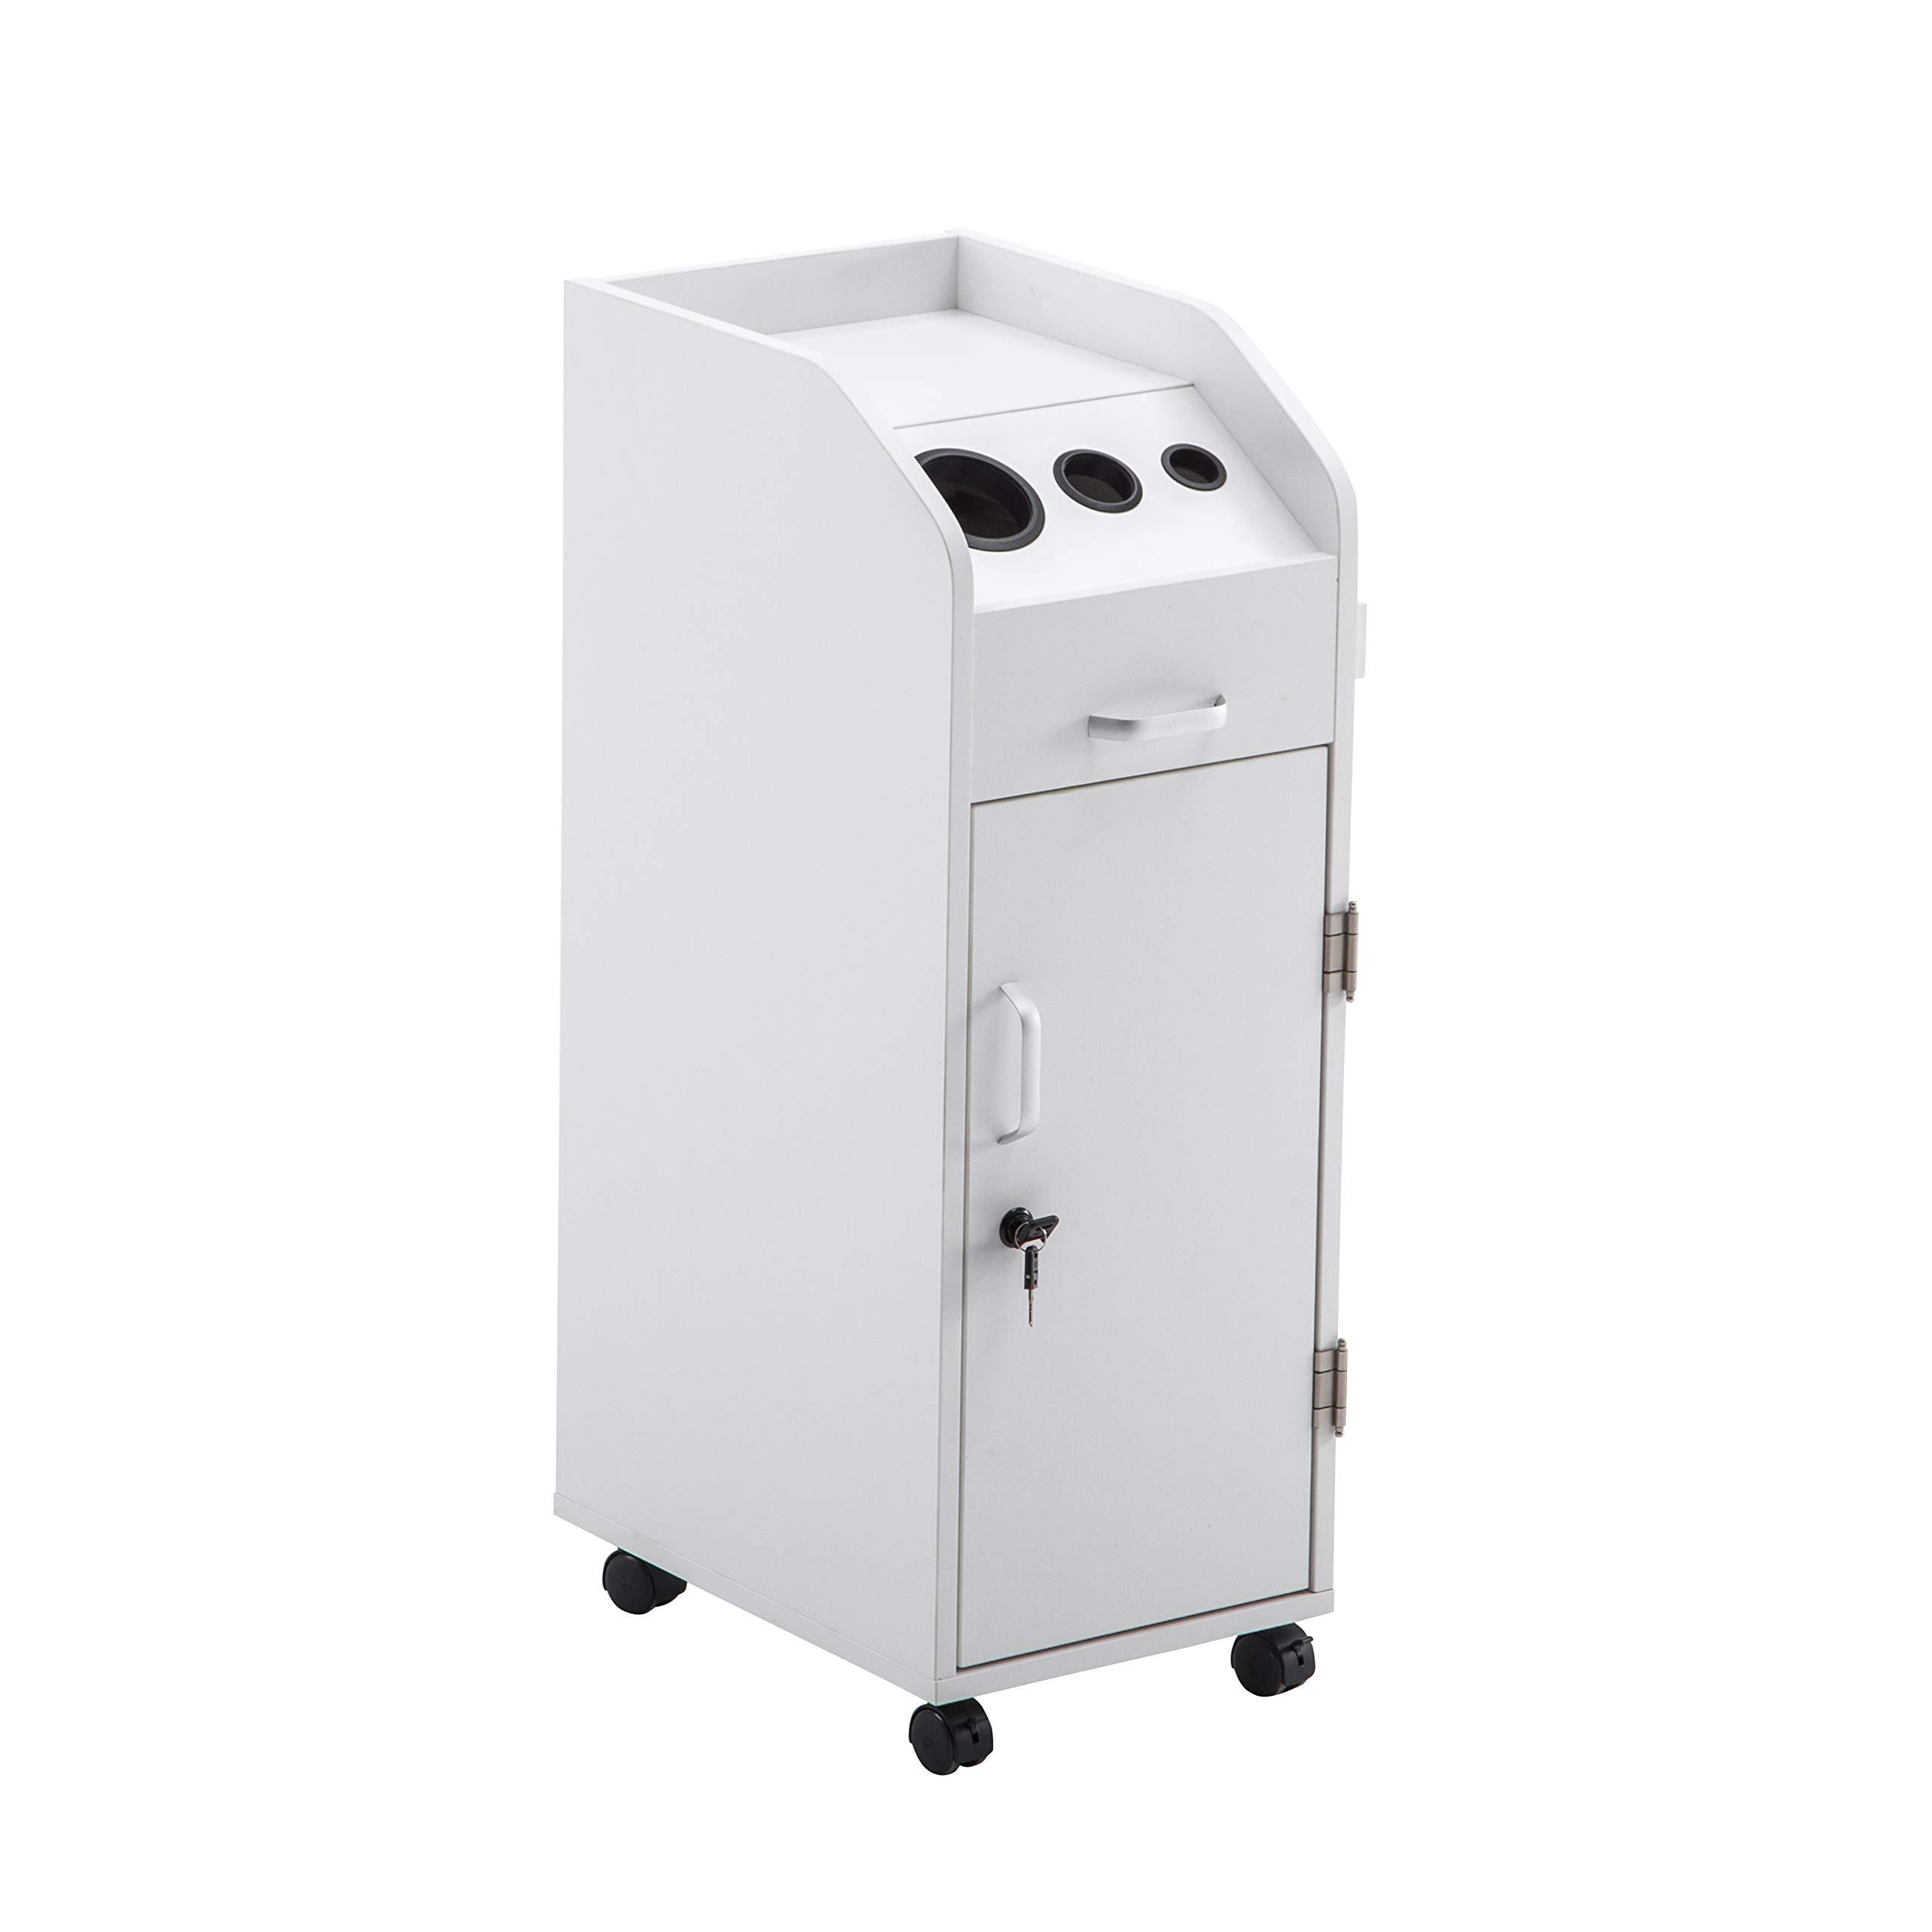 BarberPub Beauty Salon Trolley Storage Cart Hair Dryer Holder Stylist Equipment with Lockable Rolling Wheels, Drawer (White)